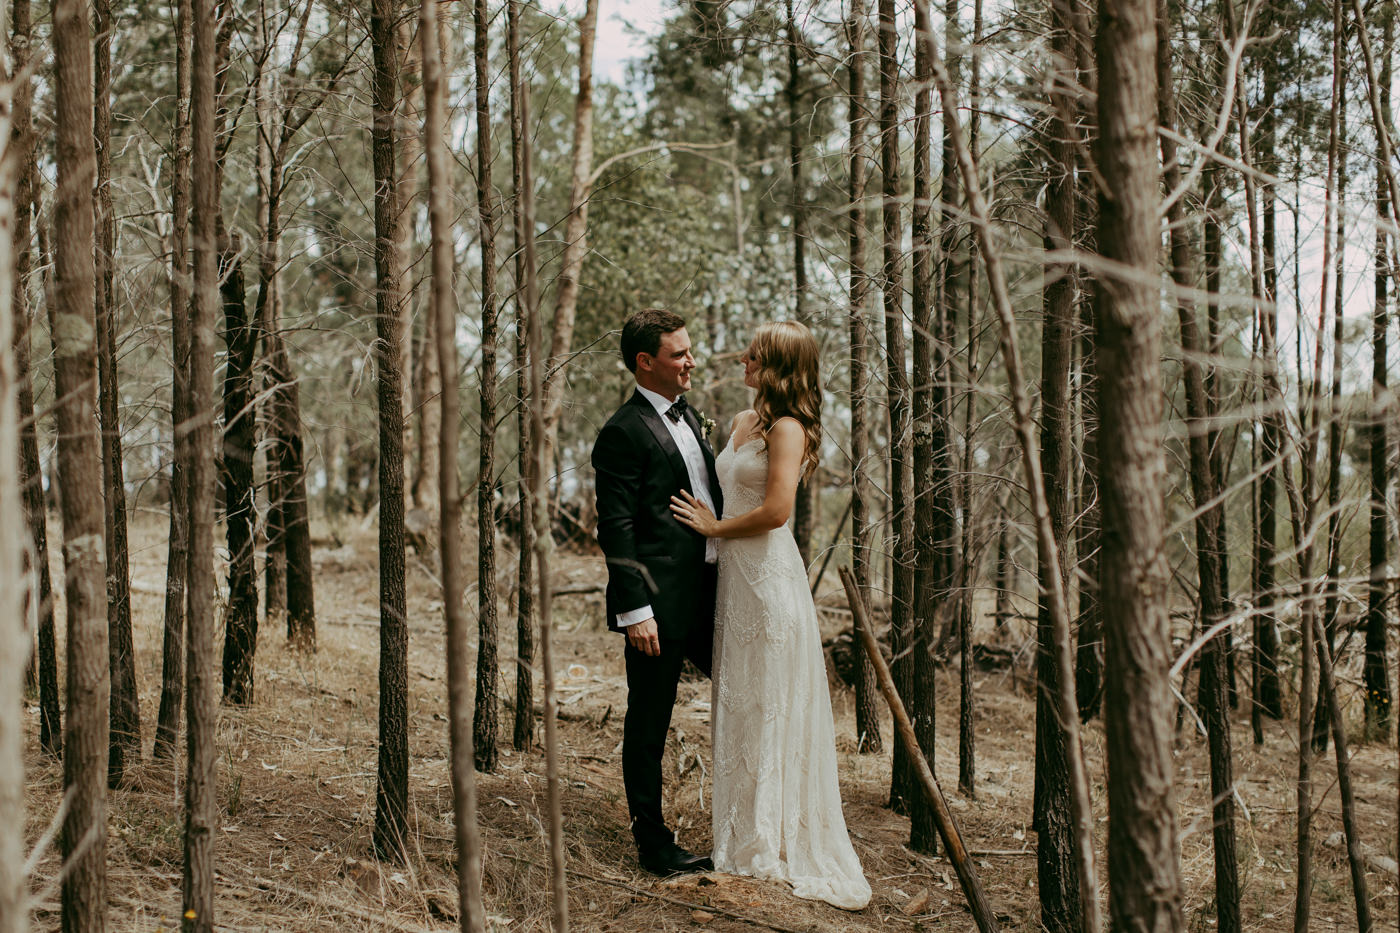 Anthony & Eliet - Wagga Wagga Wedding - Country NSW - Samantha Heather Photography-67.jpg